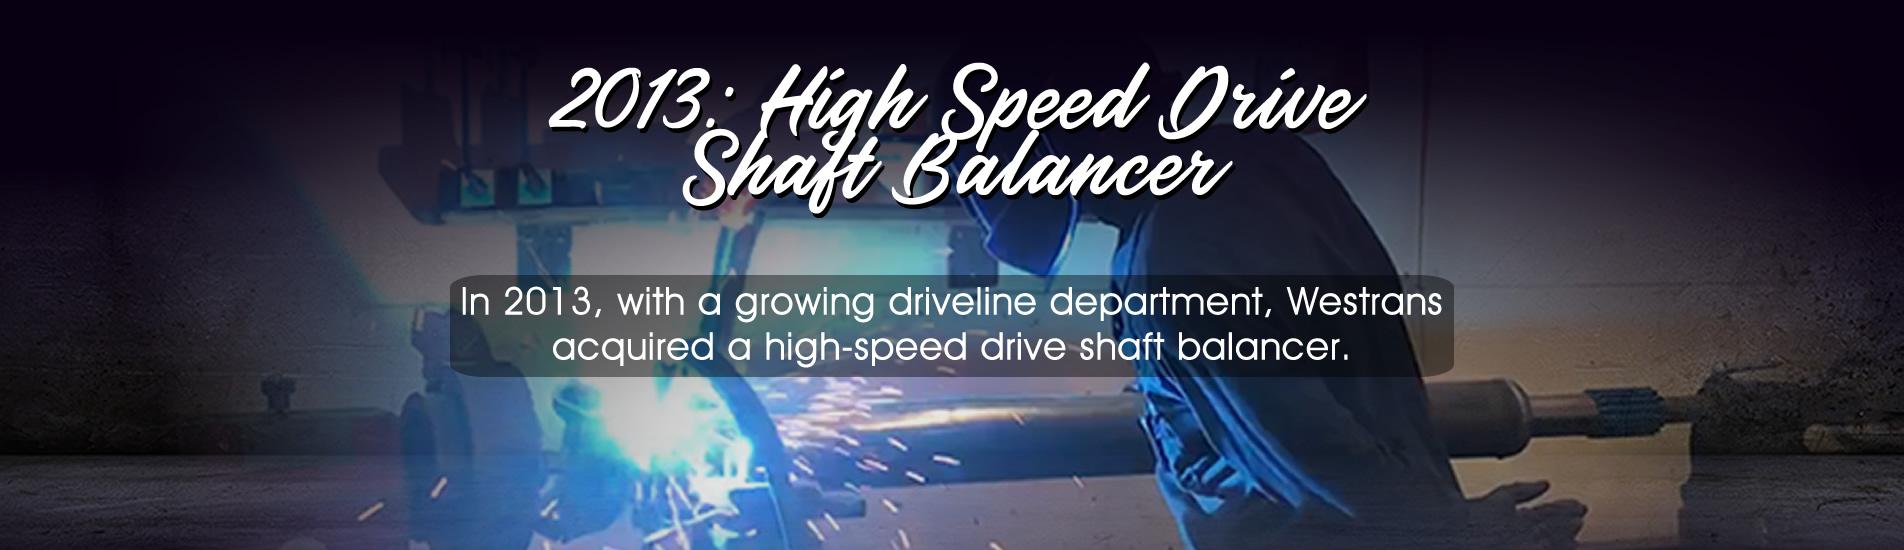 westrans-high-speed-driveshaft-2013